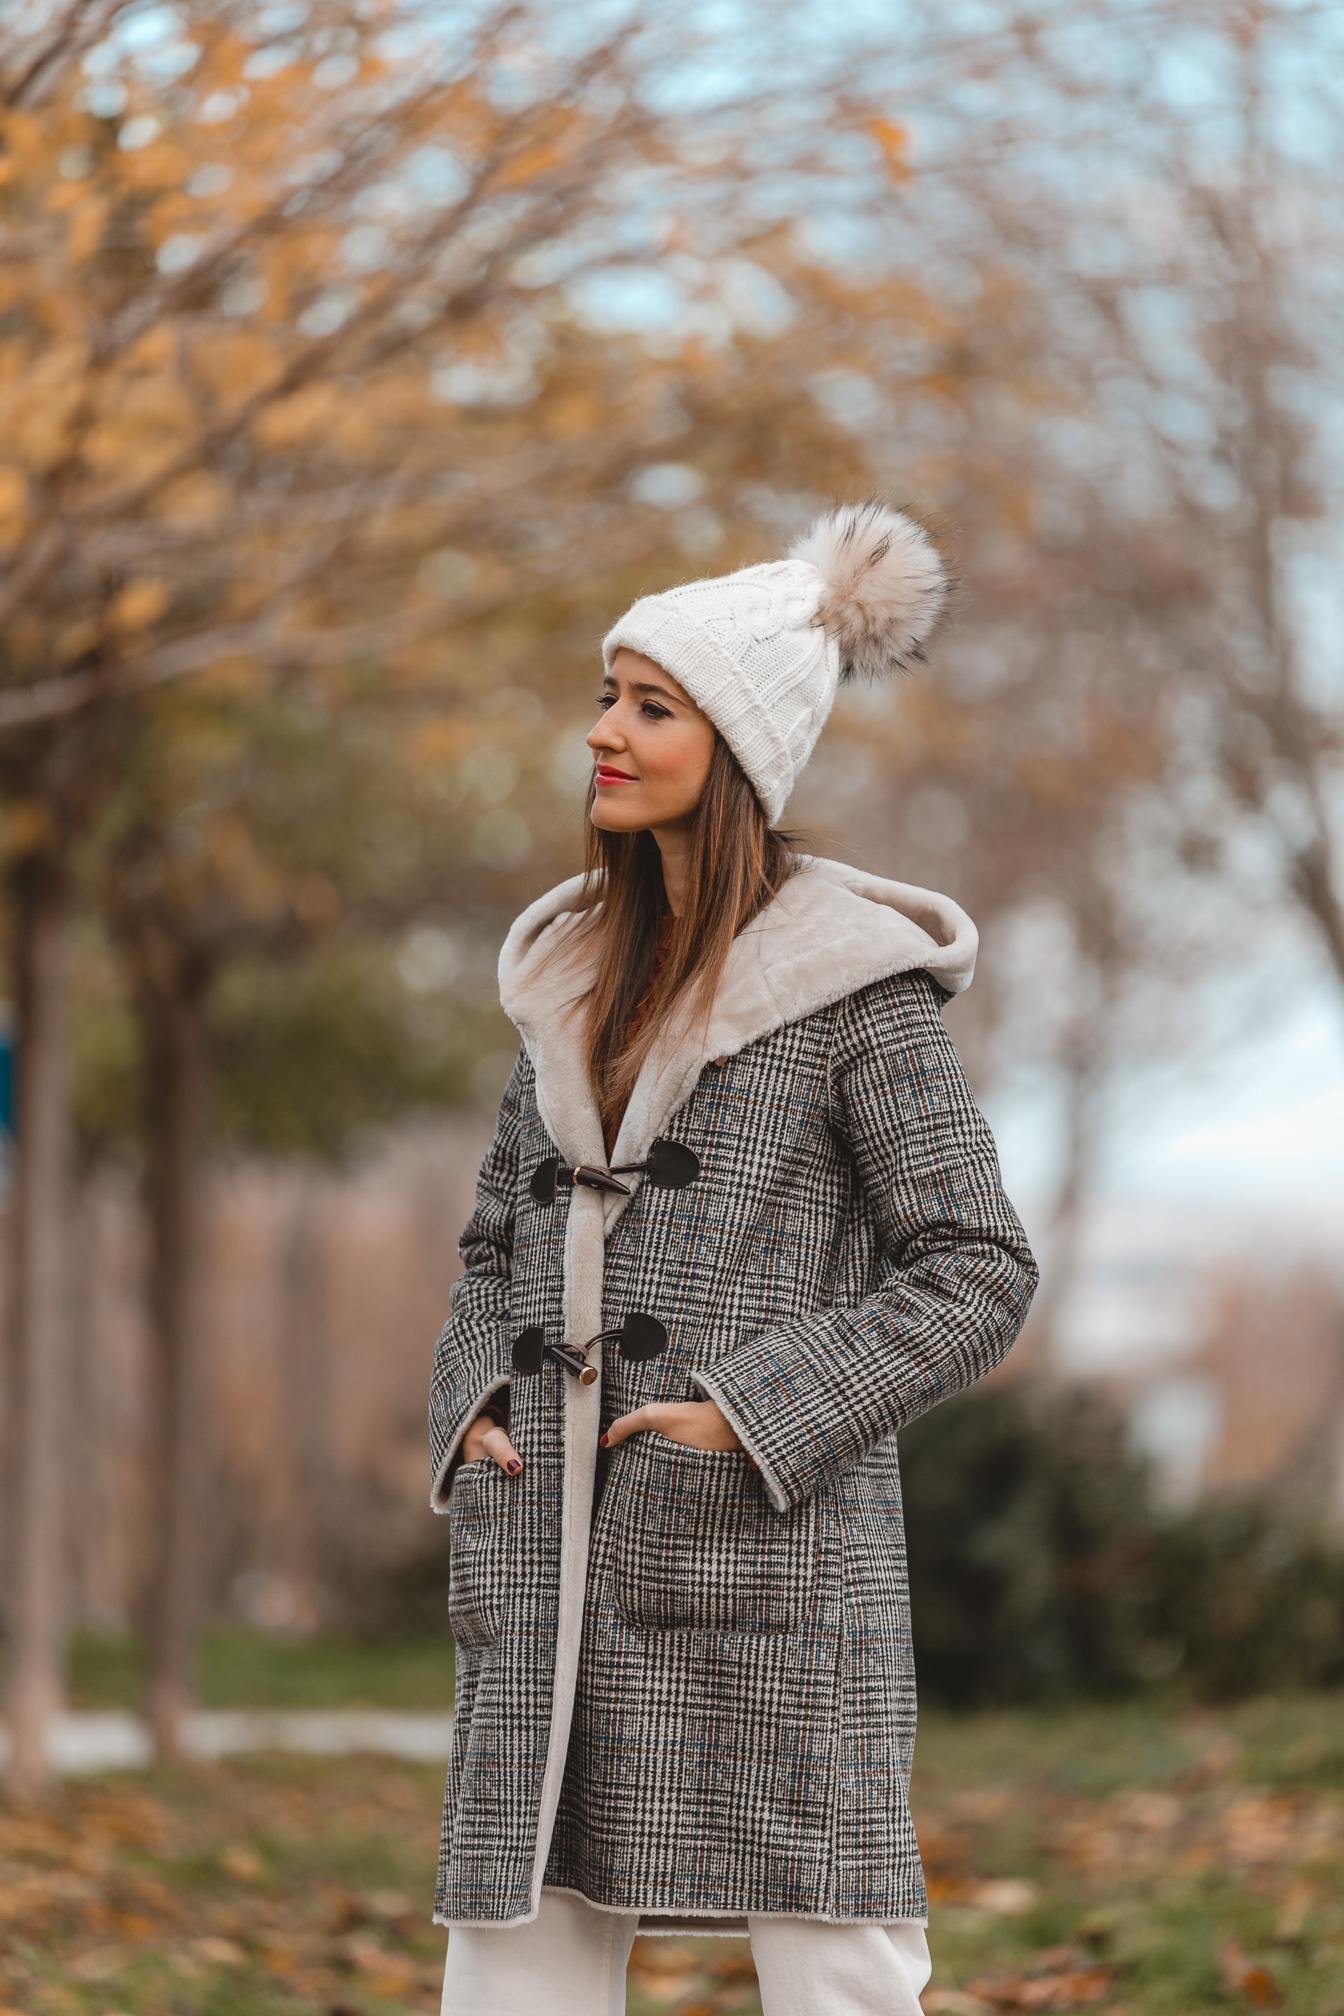 abrigo cuadros invitada perfecta